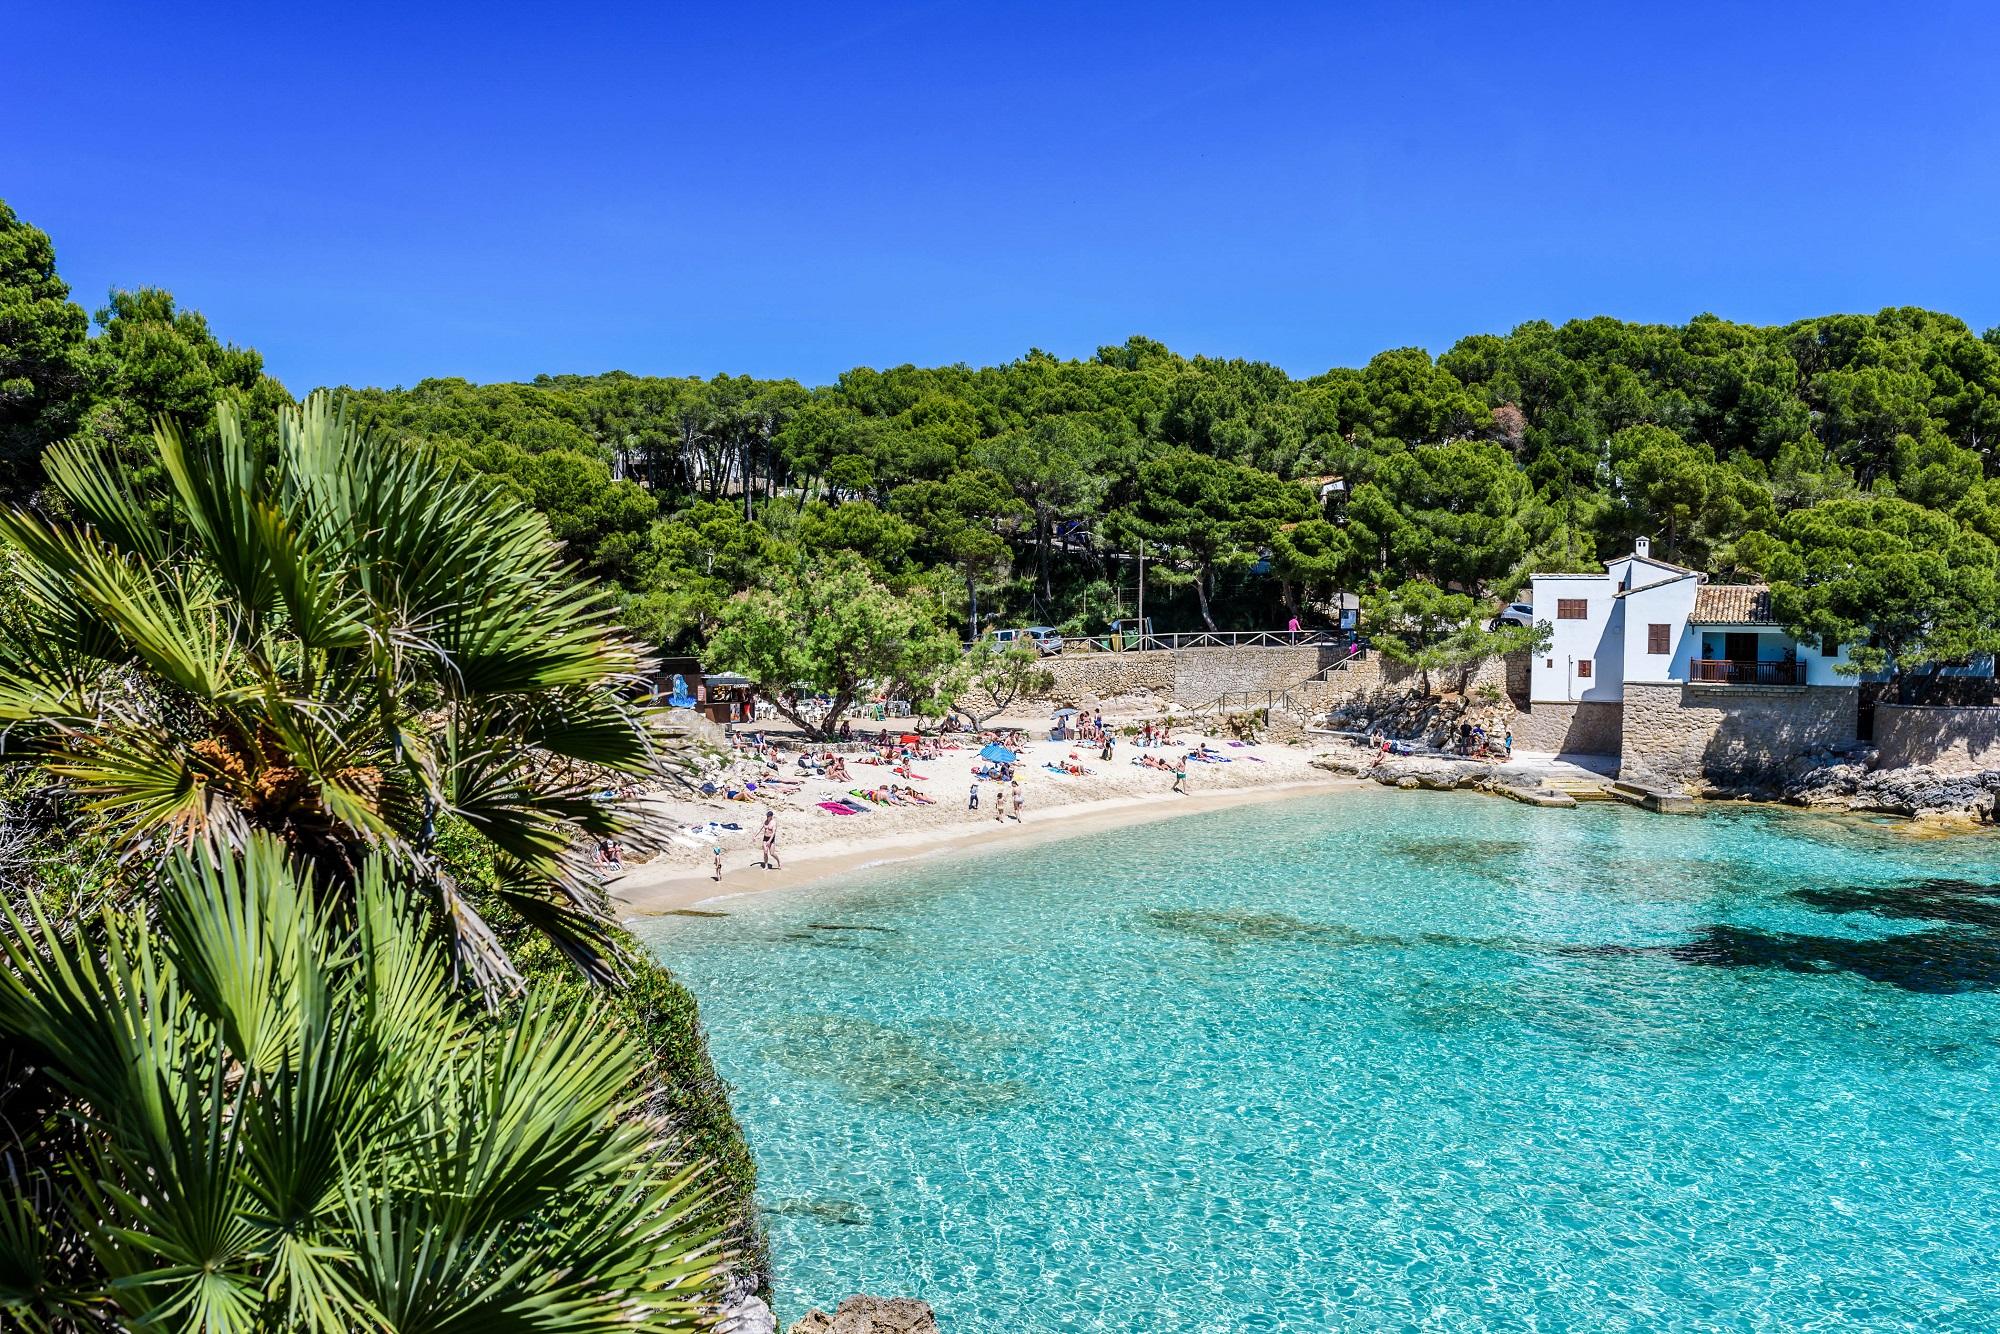 Vakantie mallorca in prachtig 4 design hotel for Mallorca design hotel